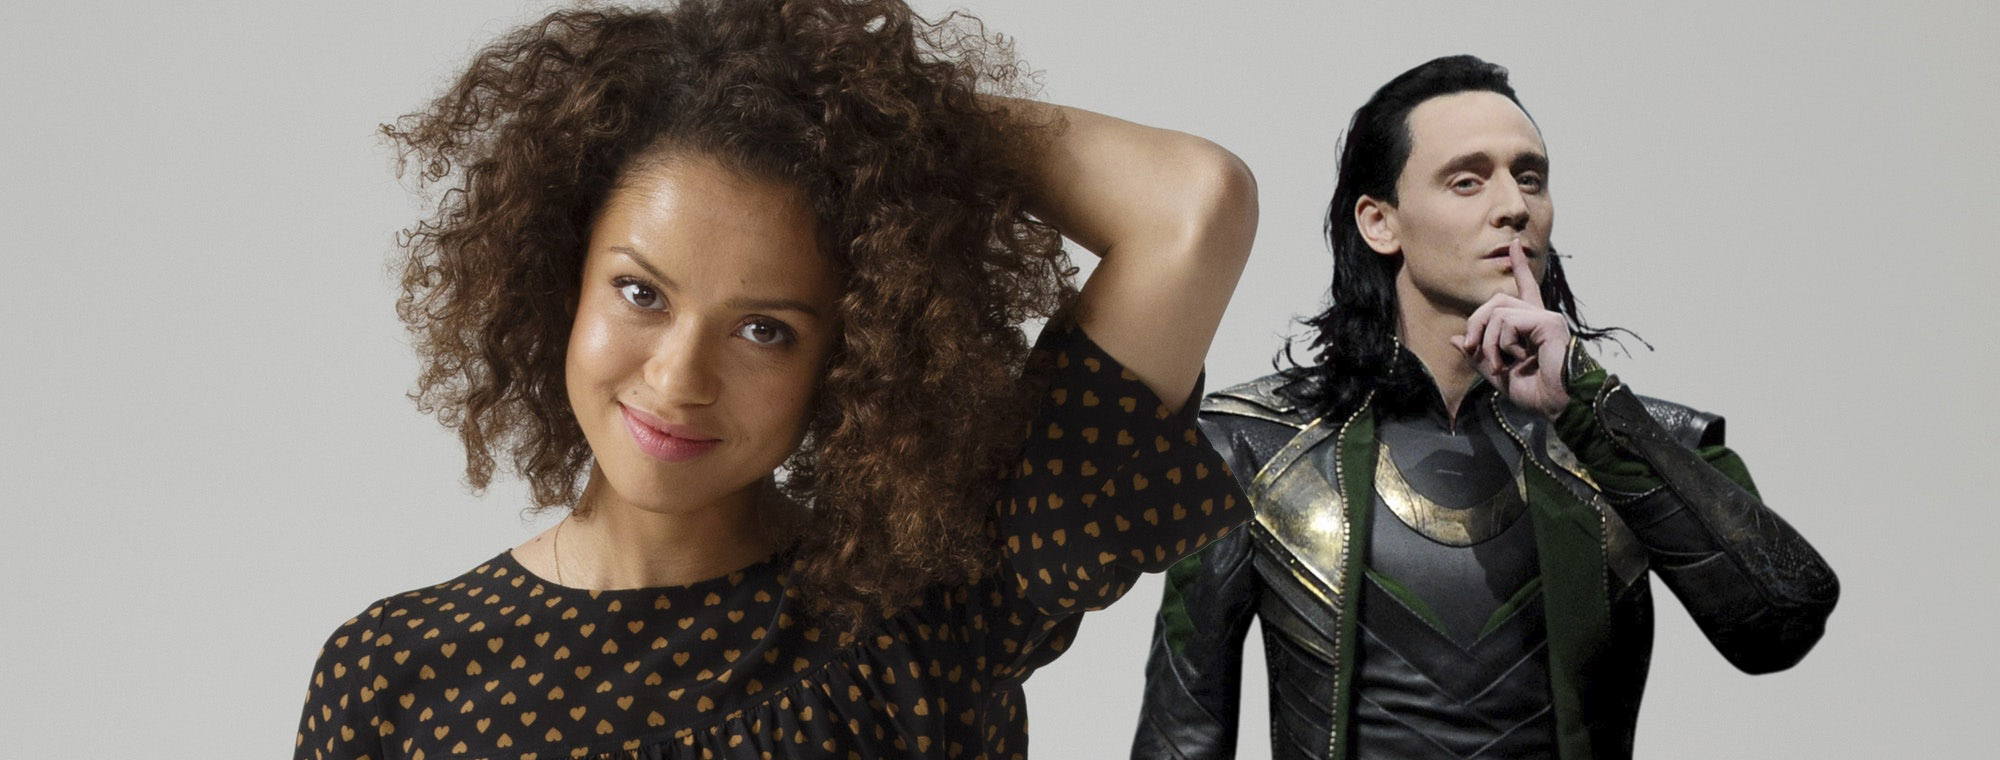 La serie Loki ficha a Gugu Mbatha-Raw